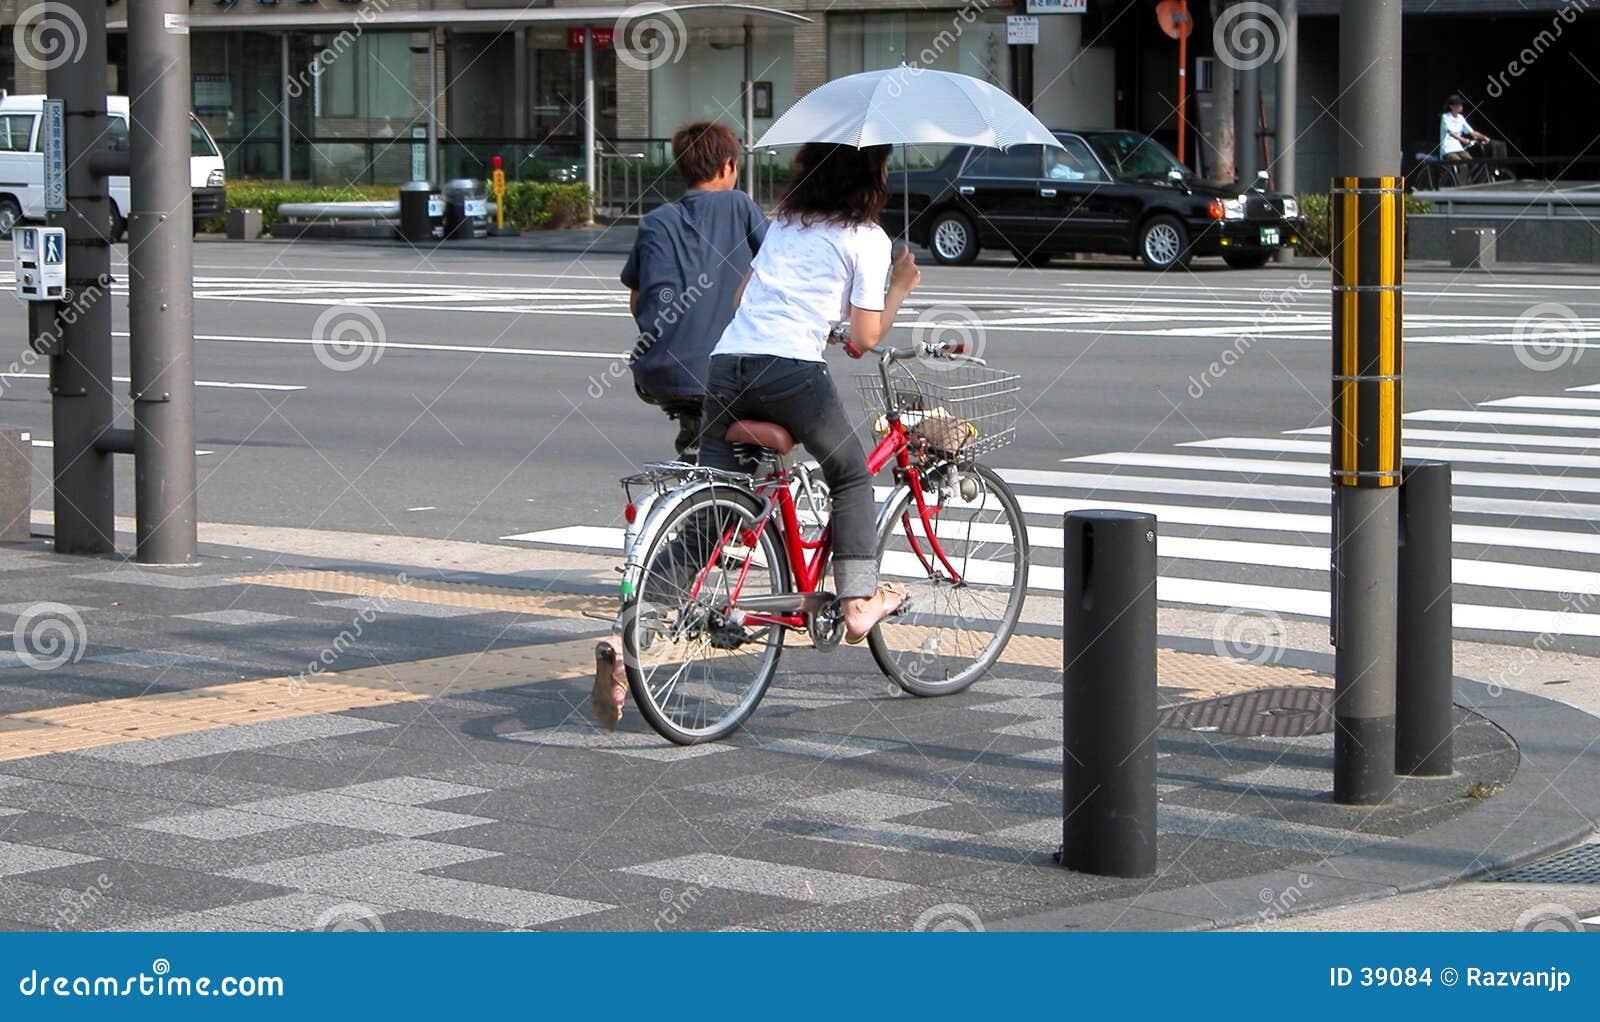 City ride.....